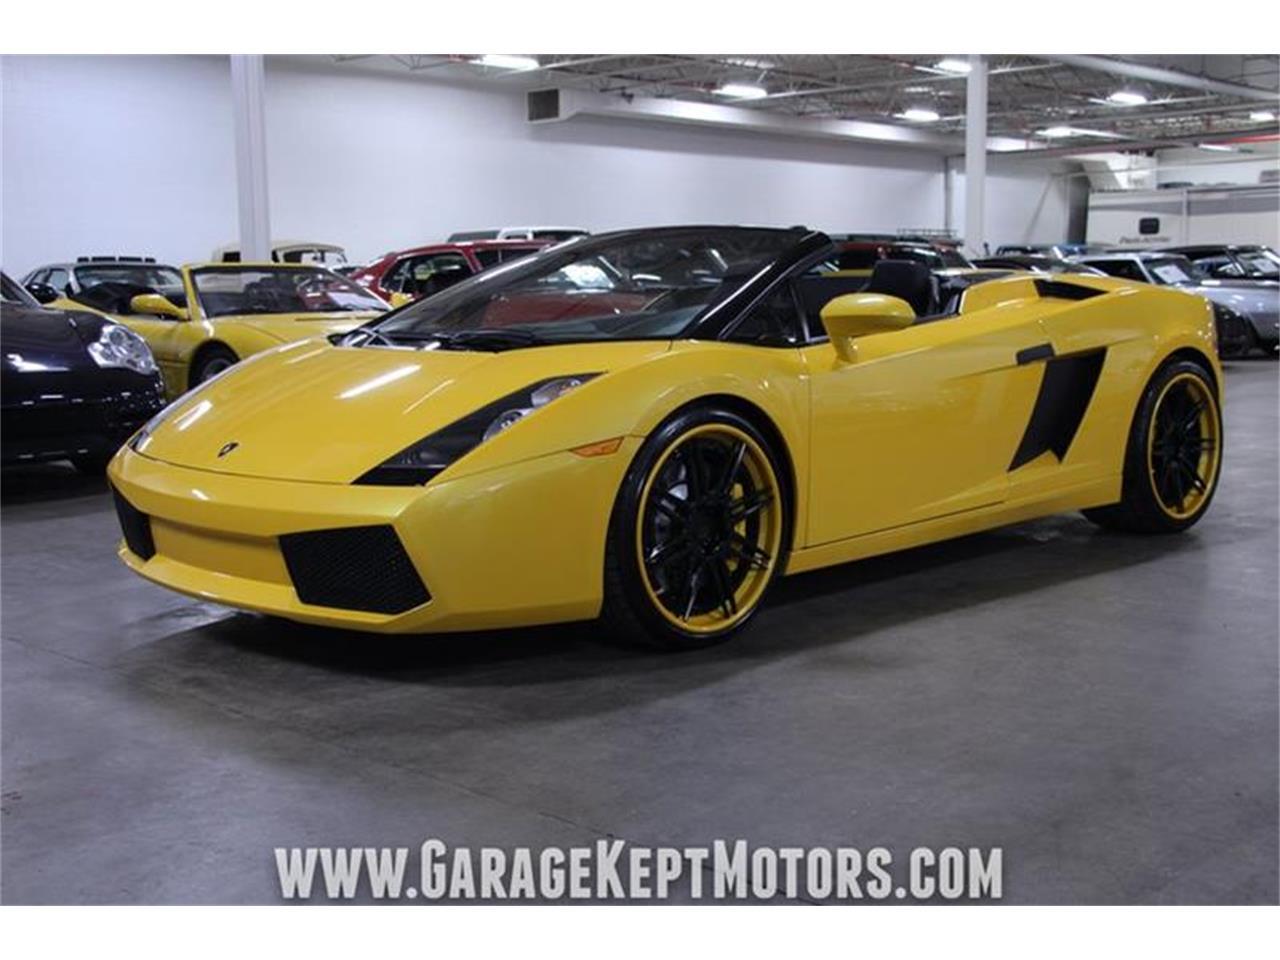 2008 Lamborghini Gallardo For Sale Classiccars Com Cc 1209123